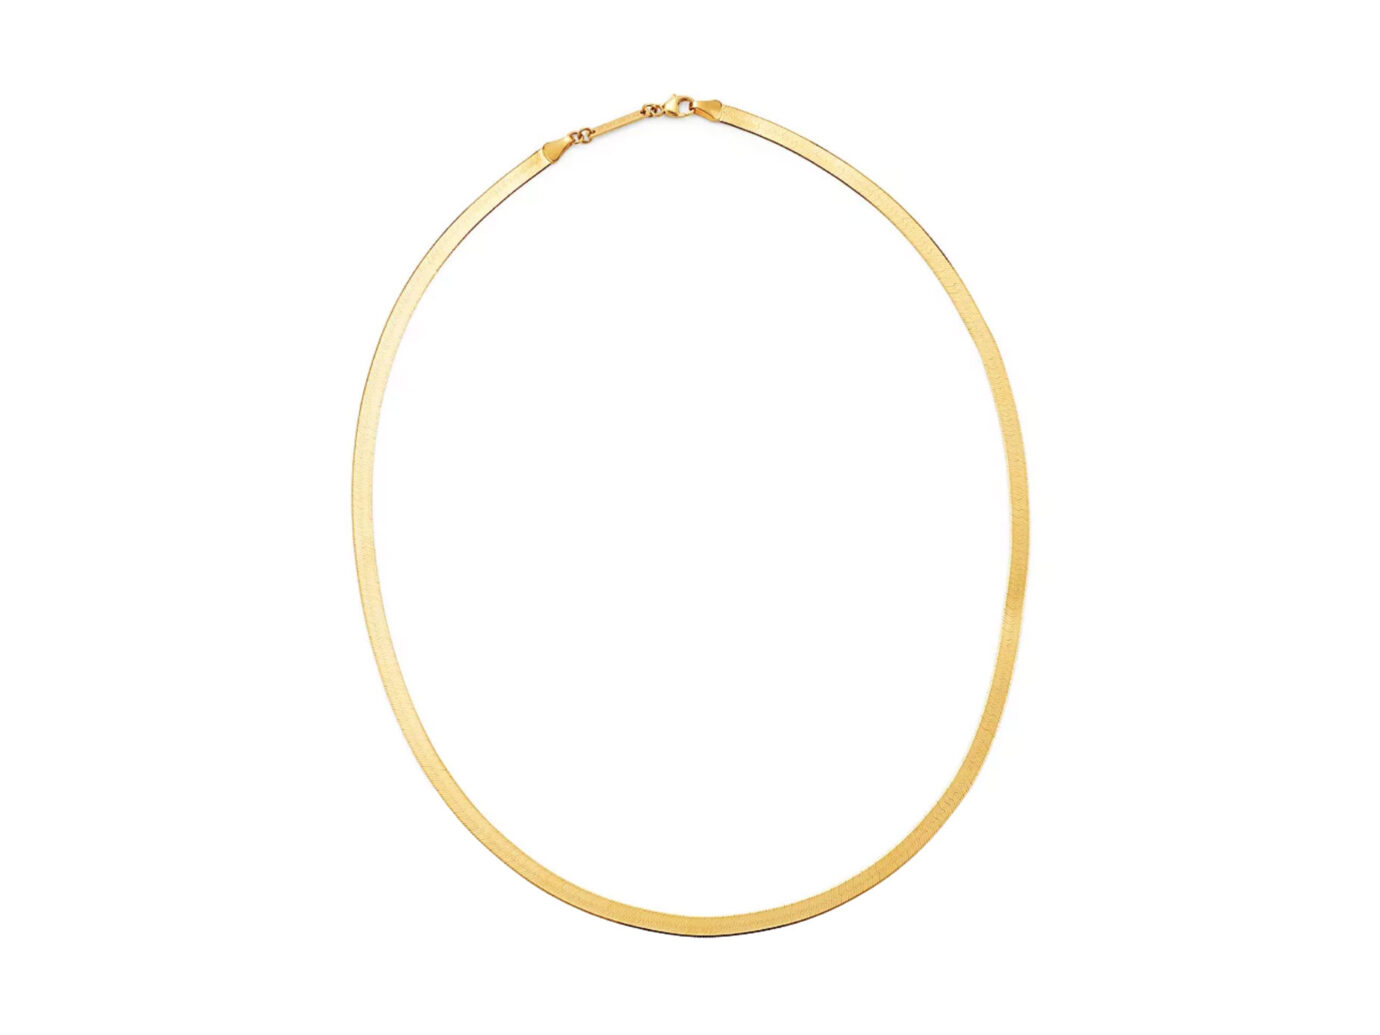 Zoë Chicco 14K Yellow Gold Herringbone Chain Necklace